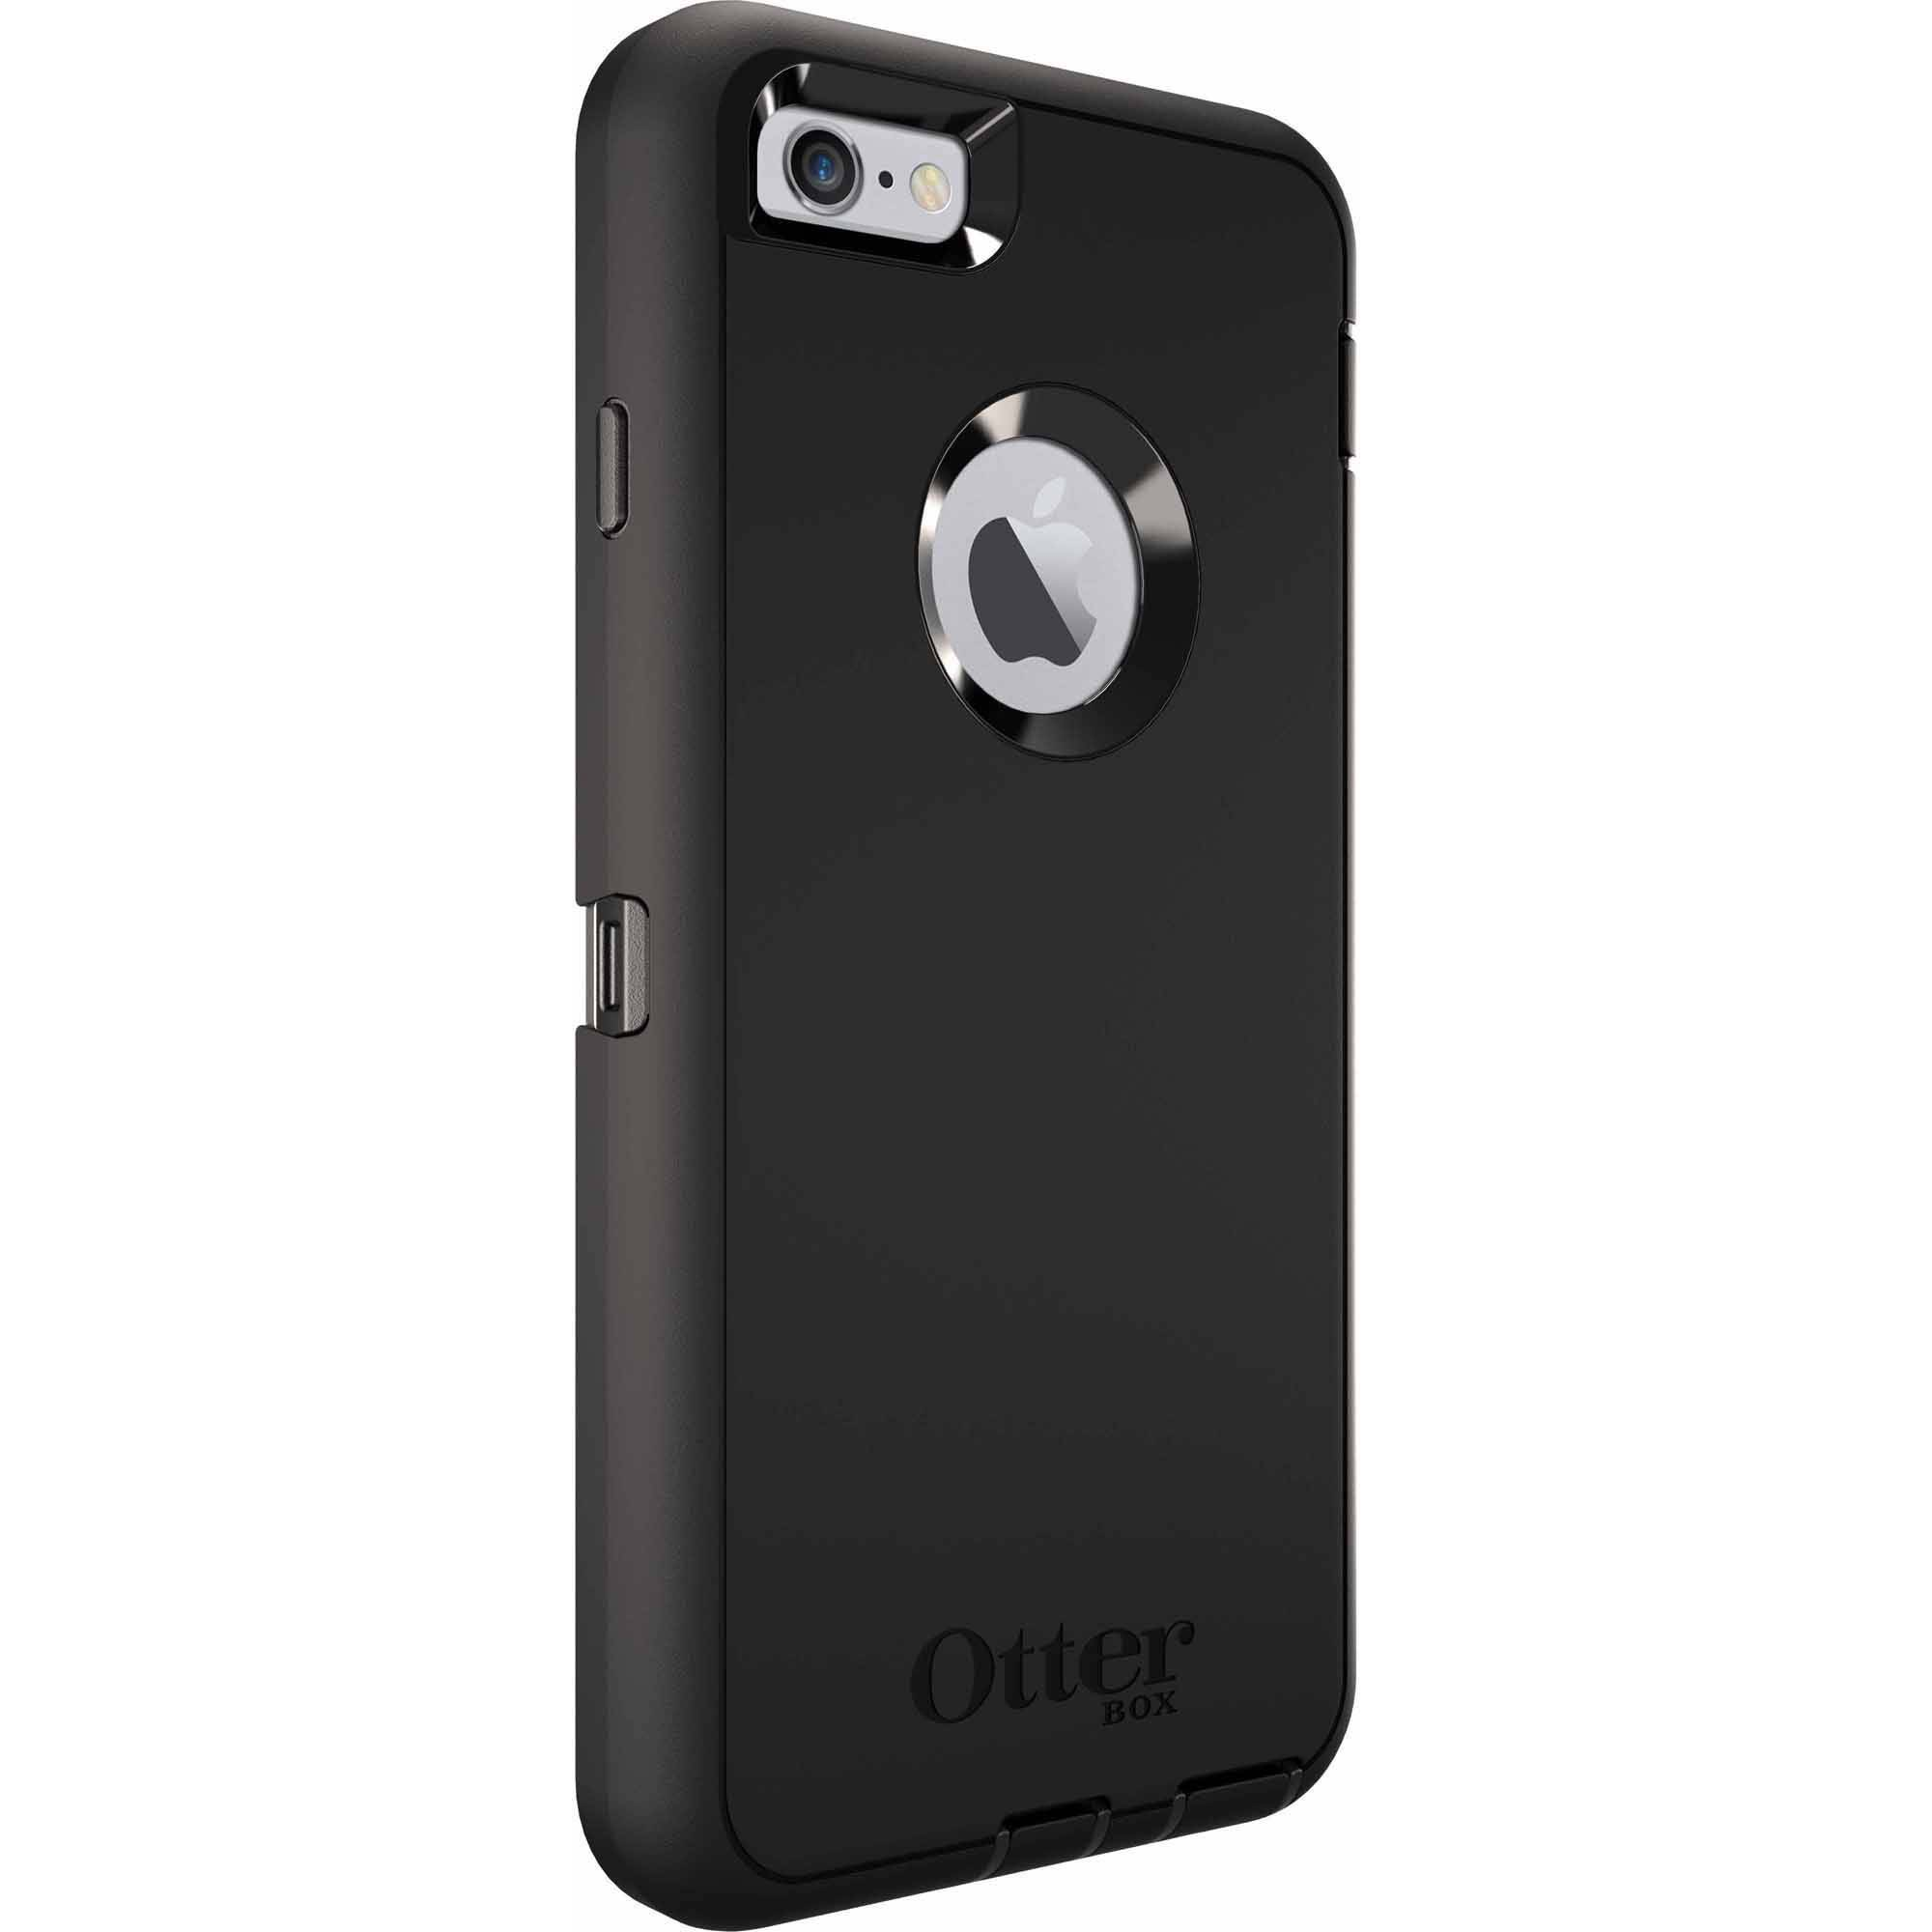 Ot otterbox iphone 6s plus covers - Ot Otterbox Iphone 6s Plus Covers